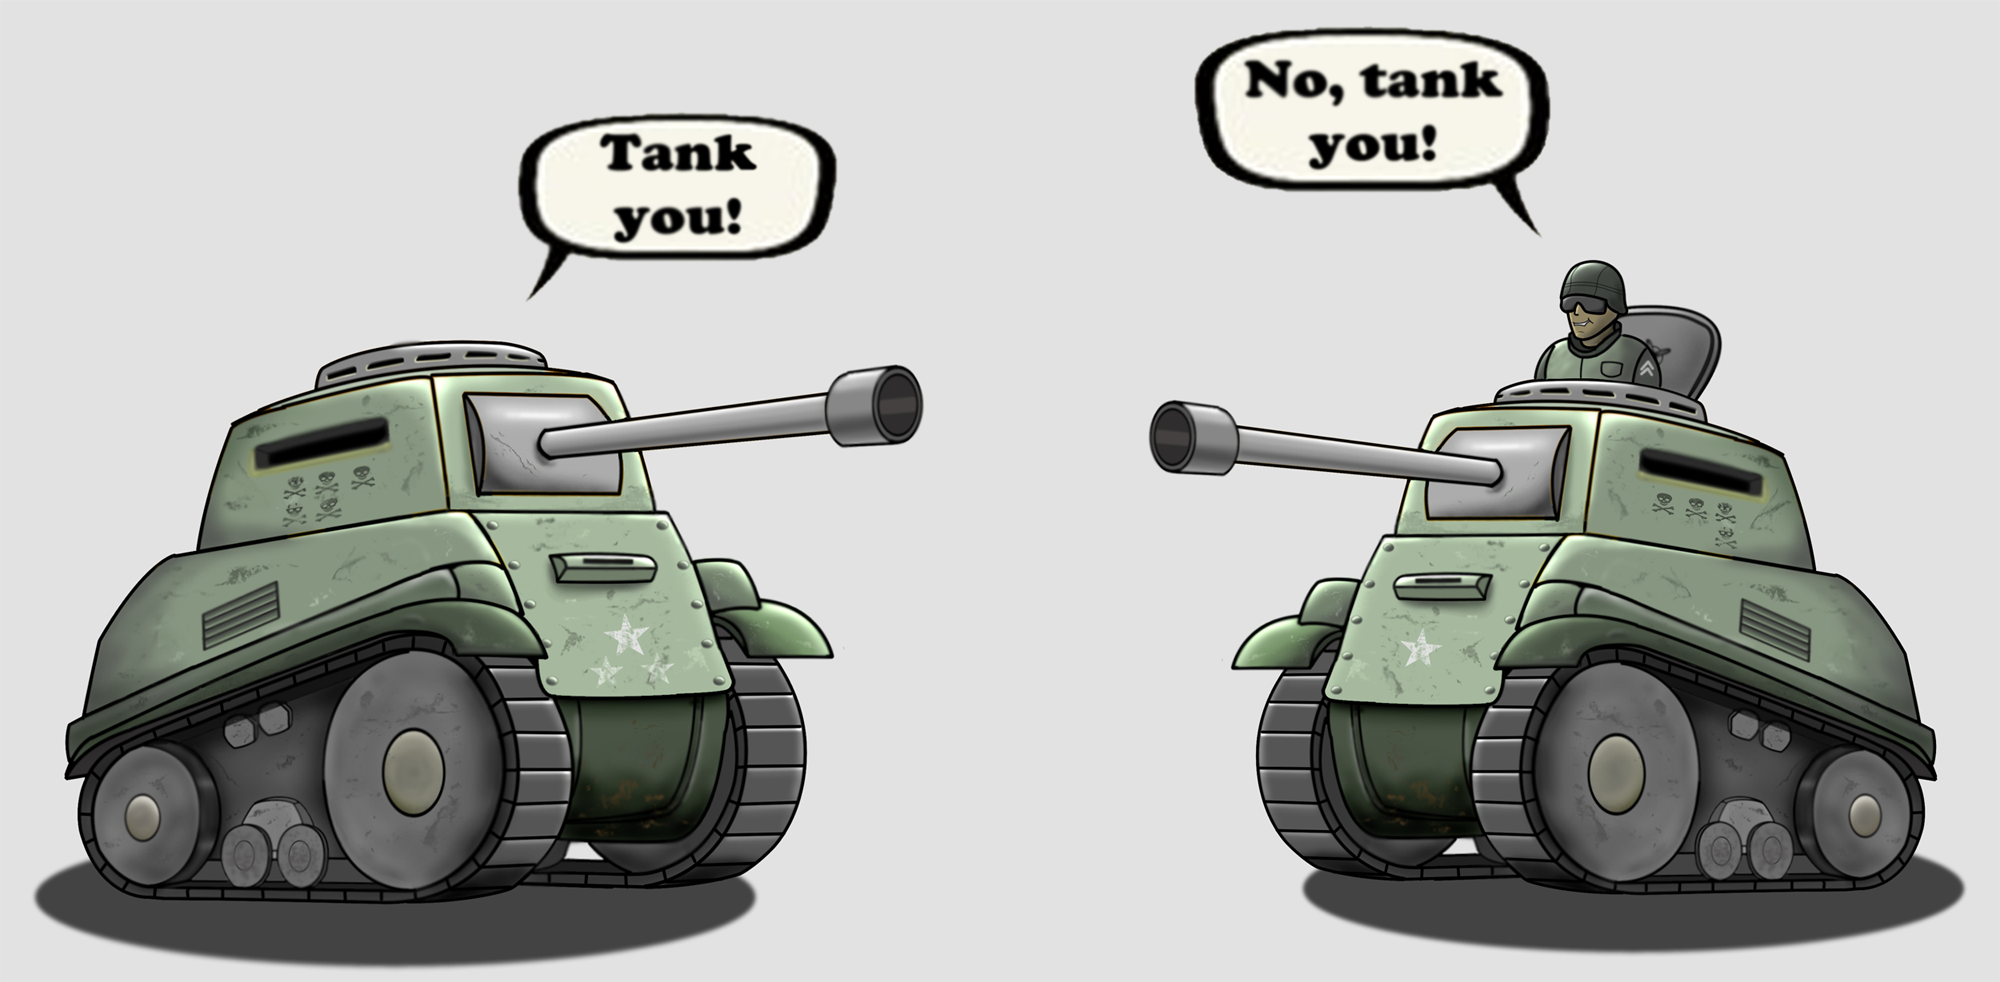 Tank you!